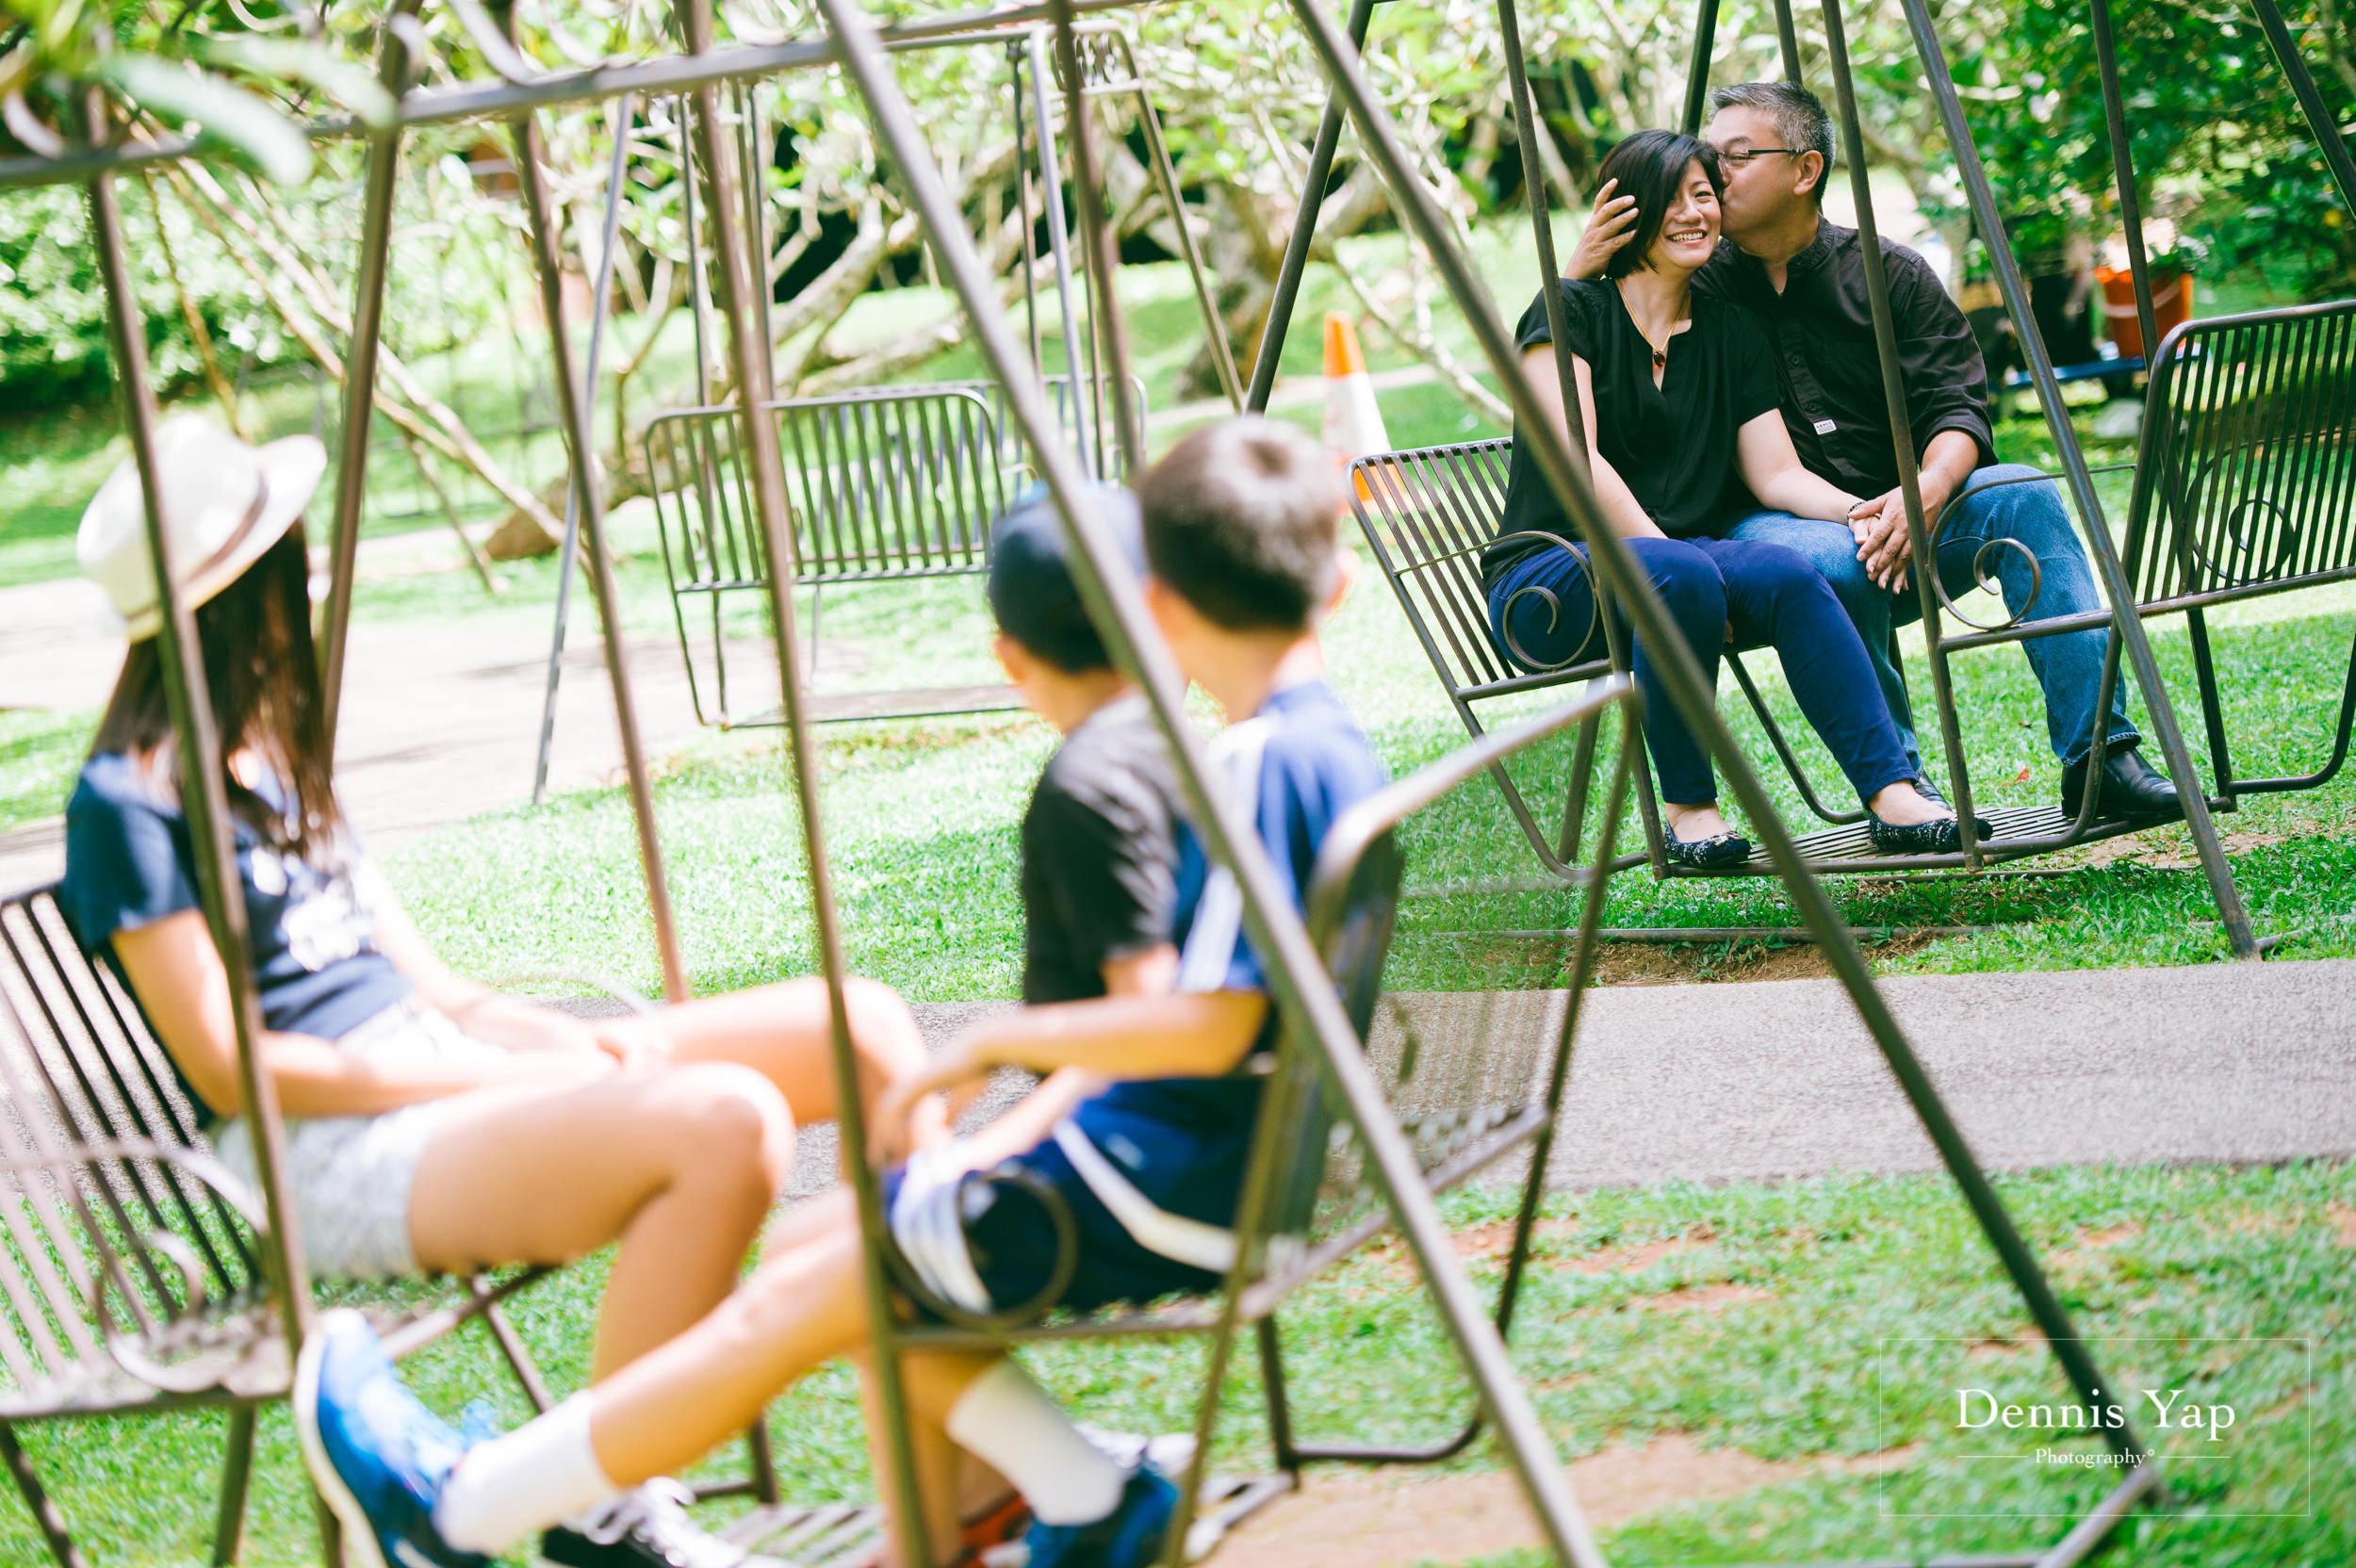 mai yin family portrait singapore botanical garden dennis yap photography malaysia-2.jpg